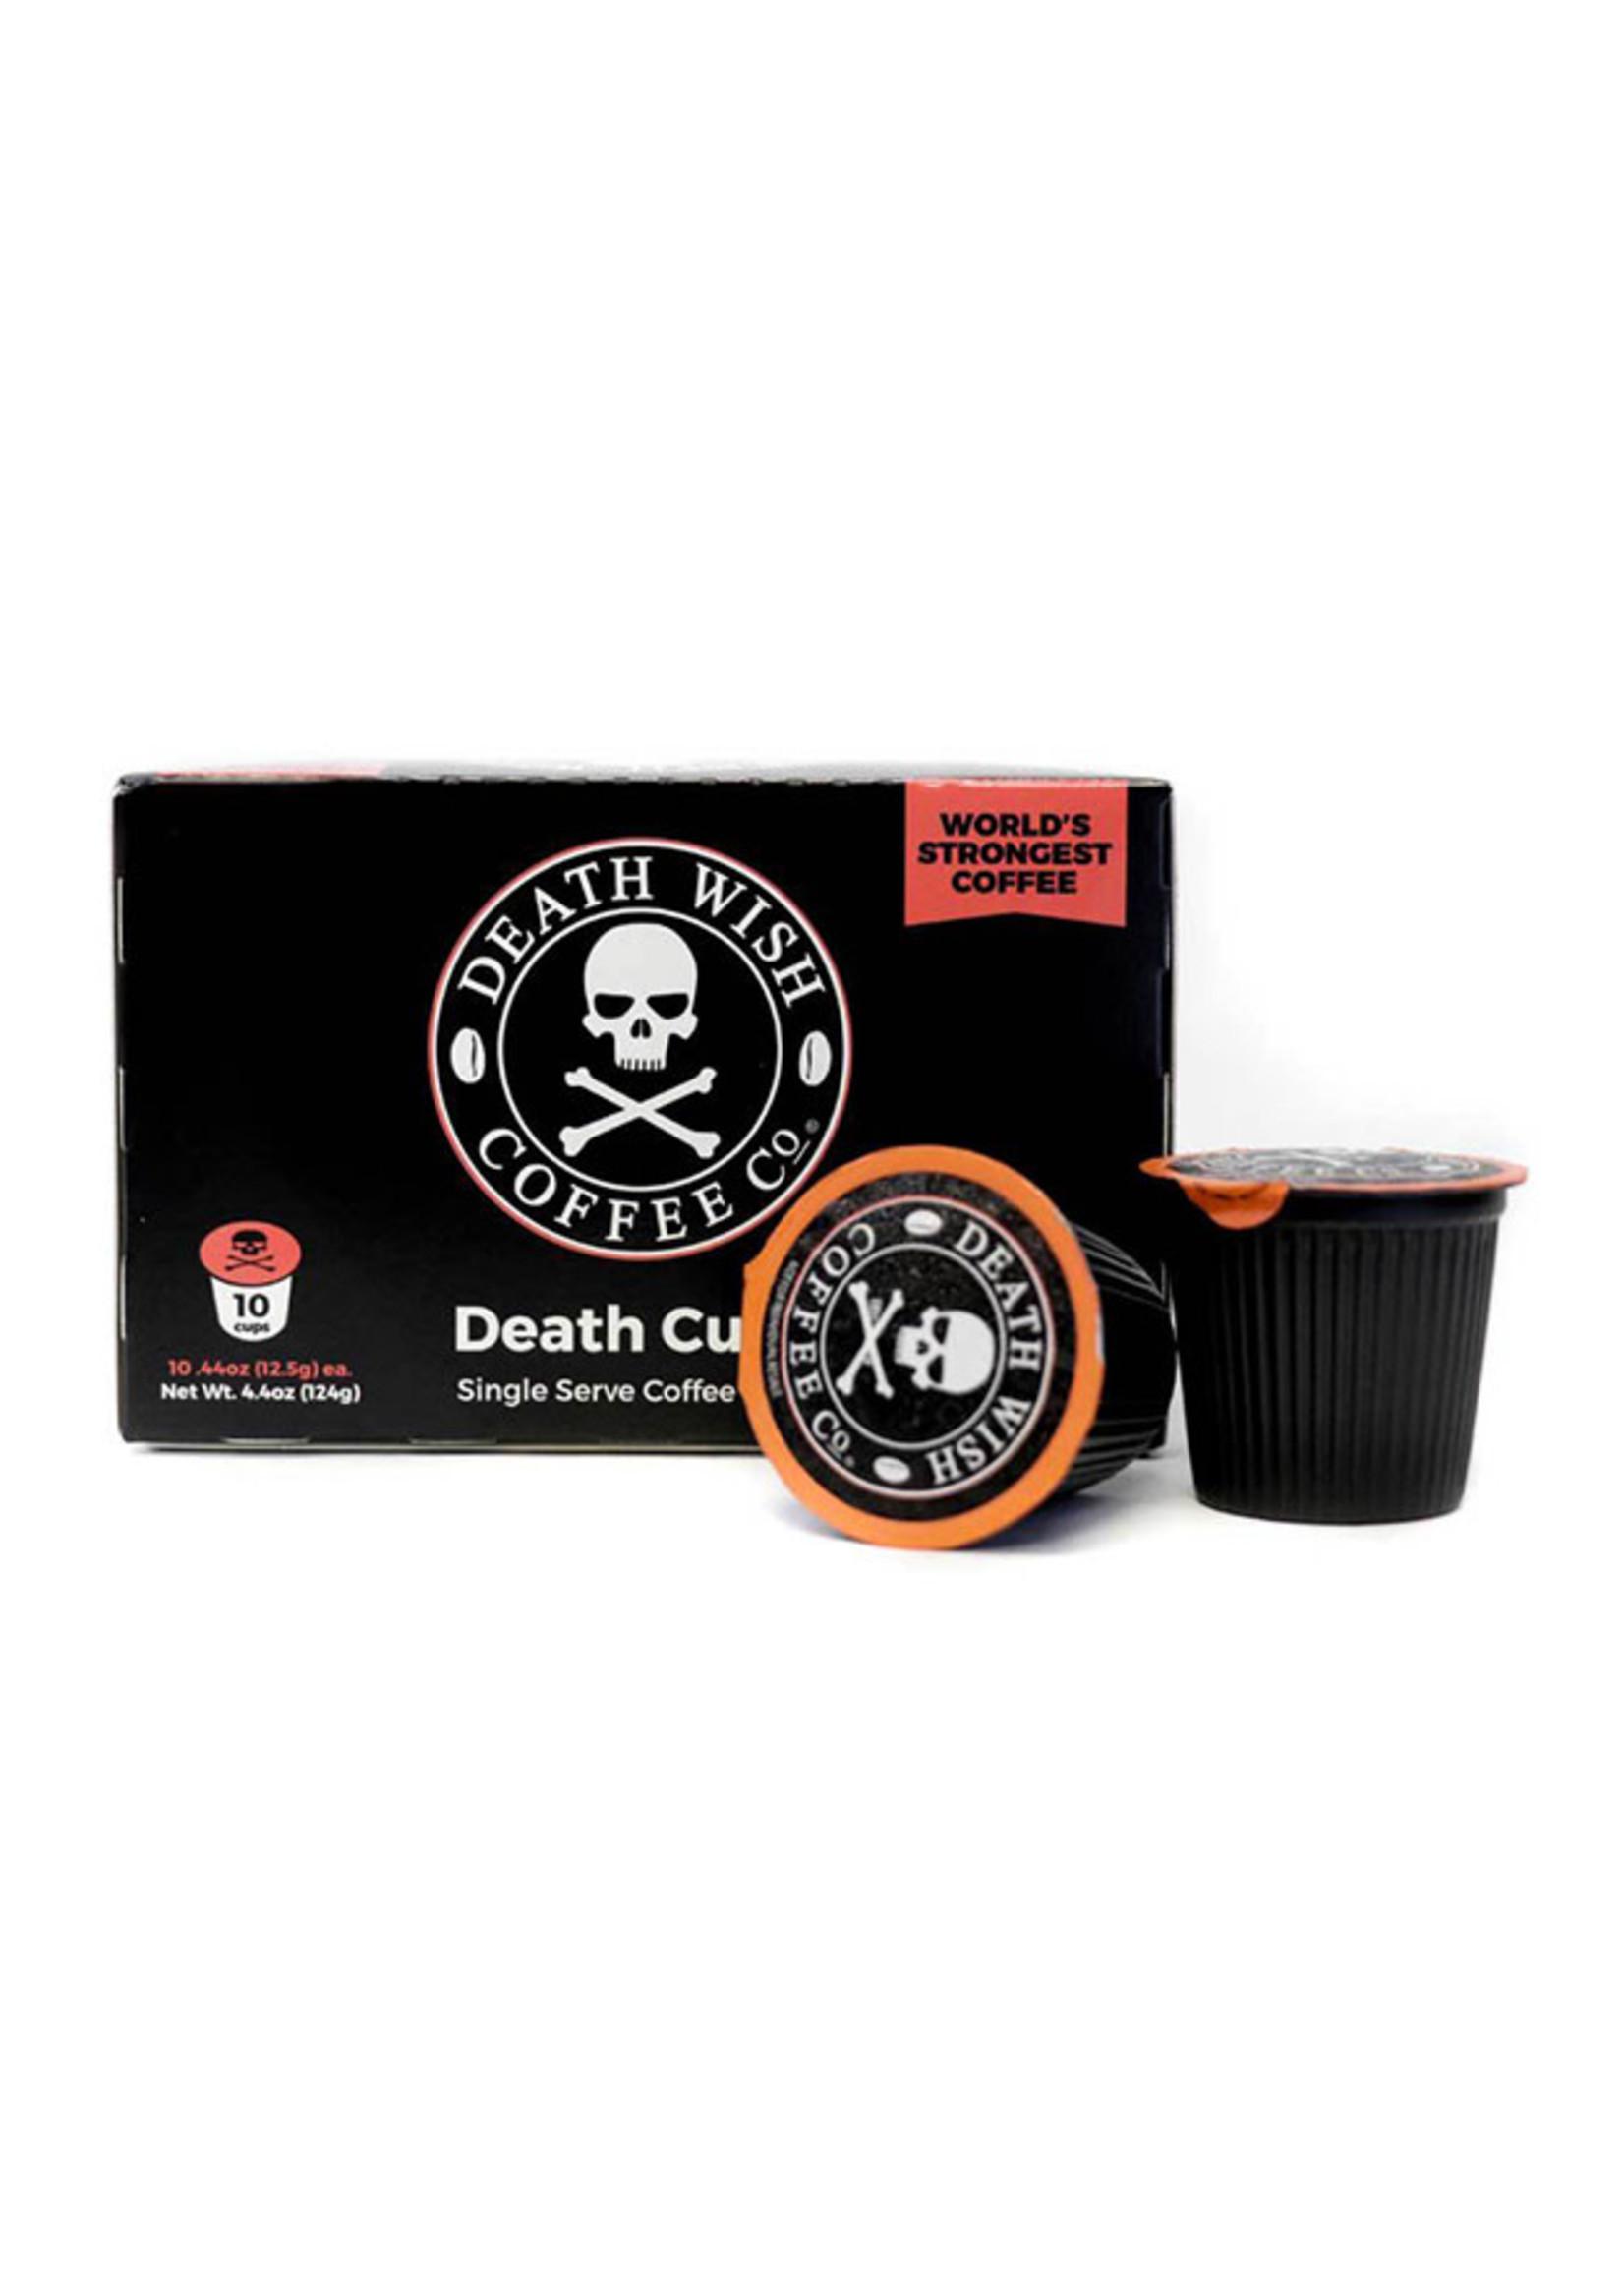 Deathwish Deathwish Death Cups Single Serve Coffee Cups 10pk